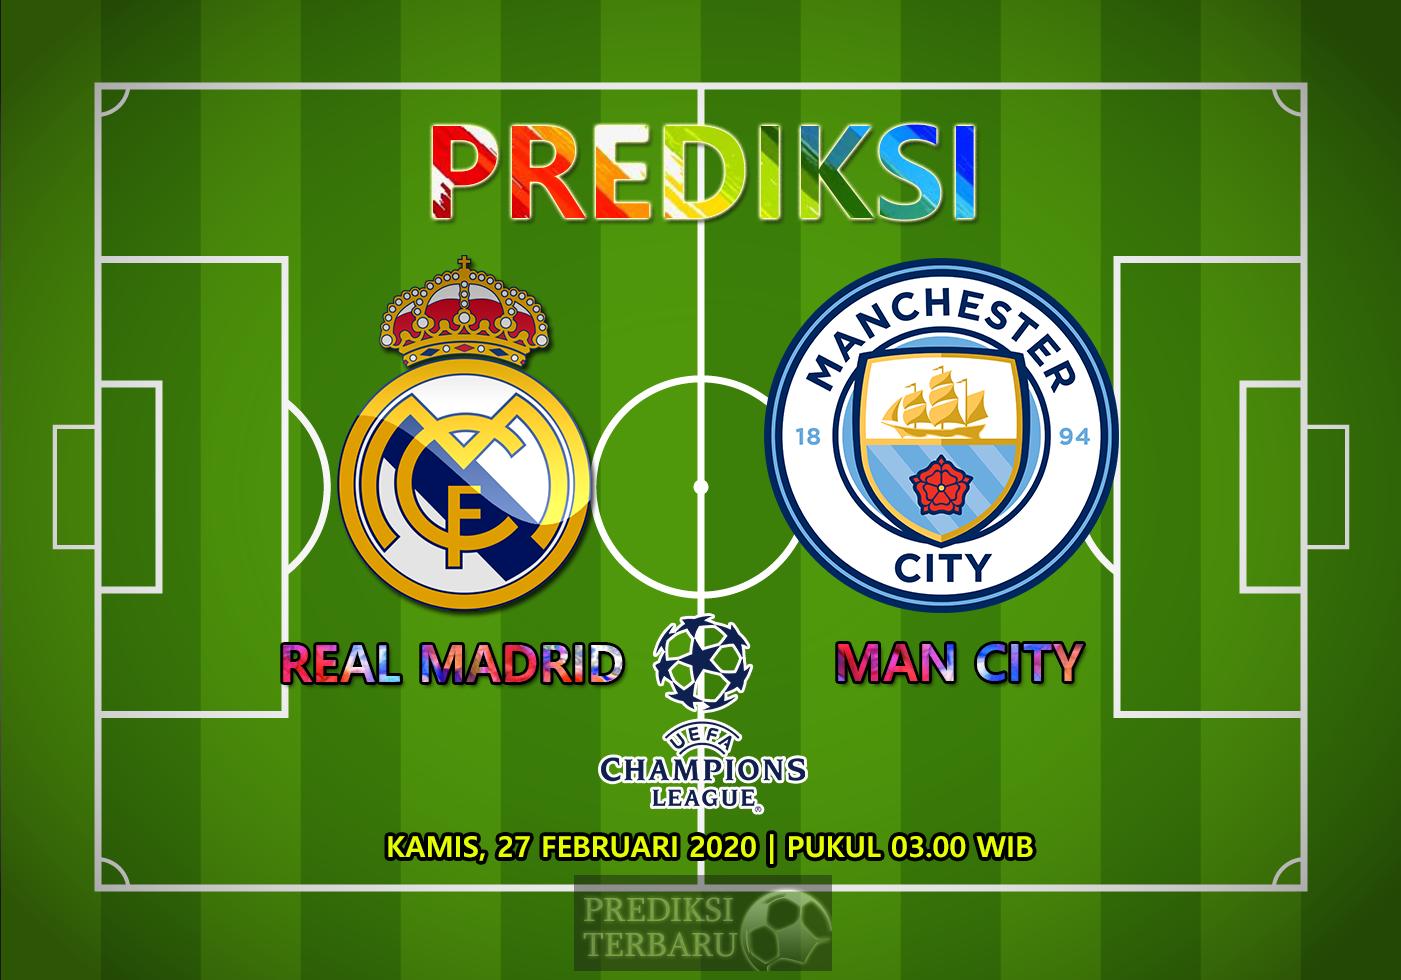 Prediksi Real Madrid Vs Manchester City, Kamis 27 Februari